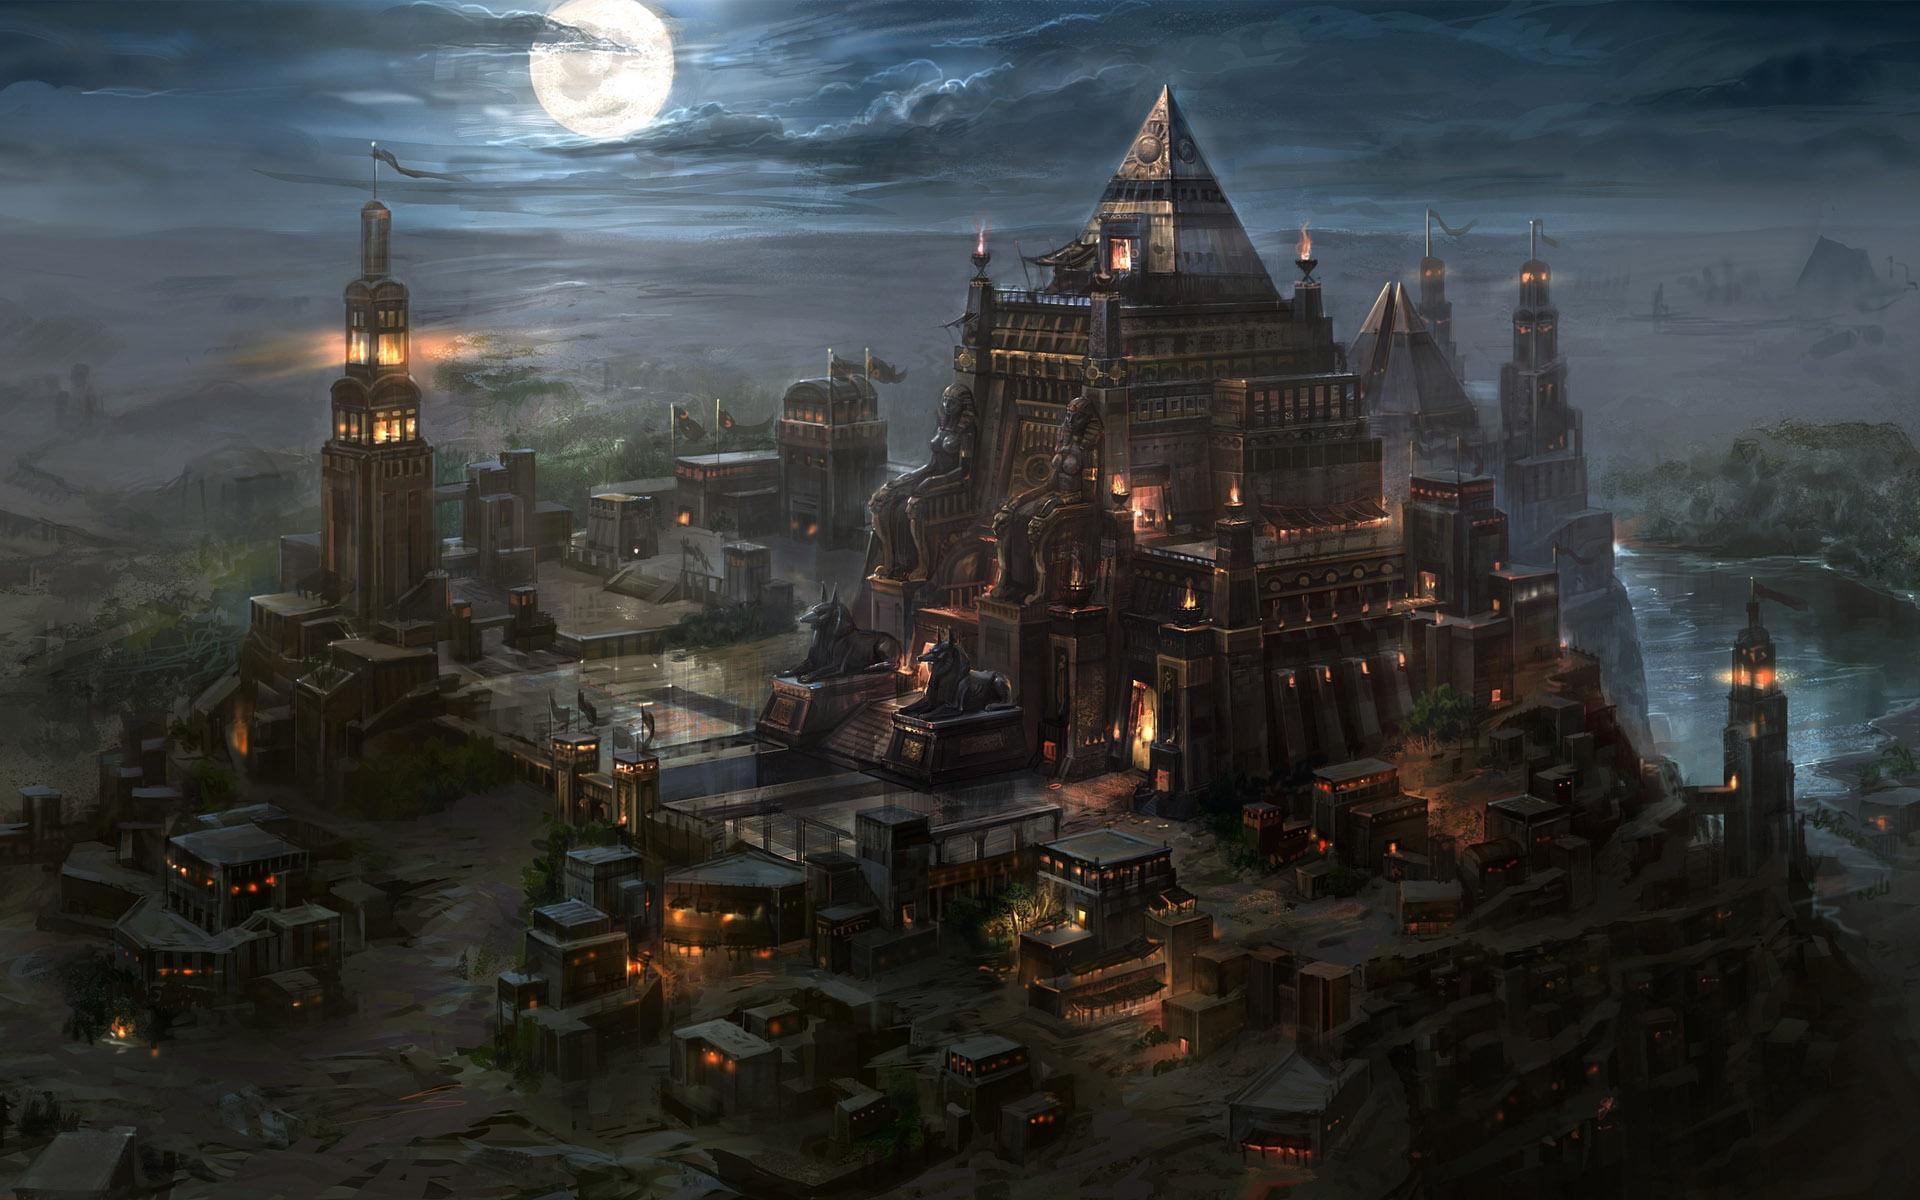 Kingdom Under Fire IIfantasy art cities castle buildings temple night 1920x1200